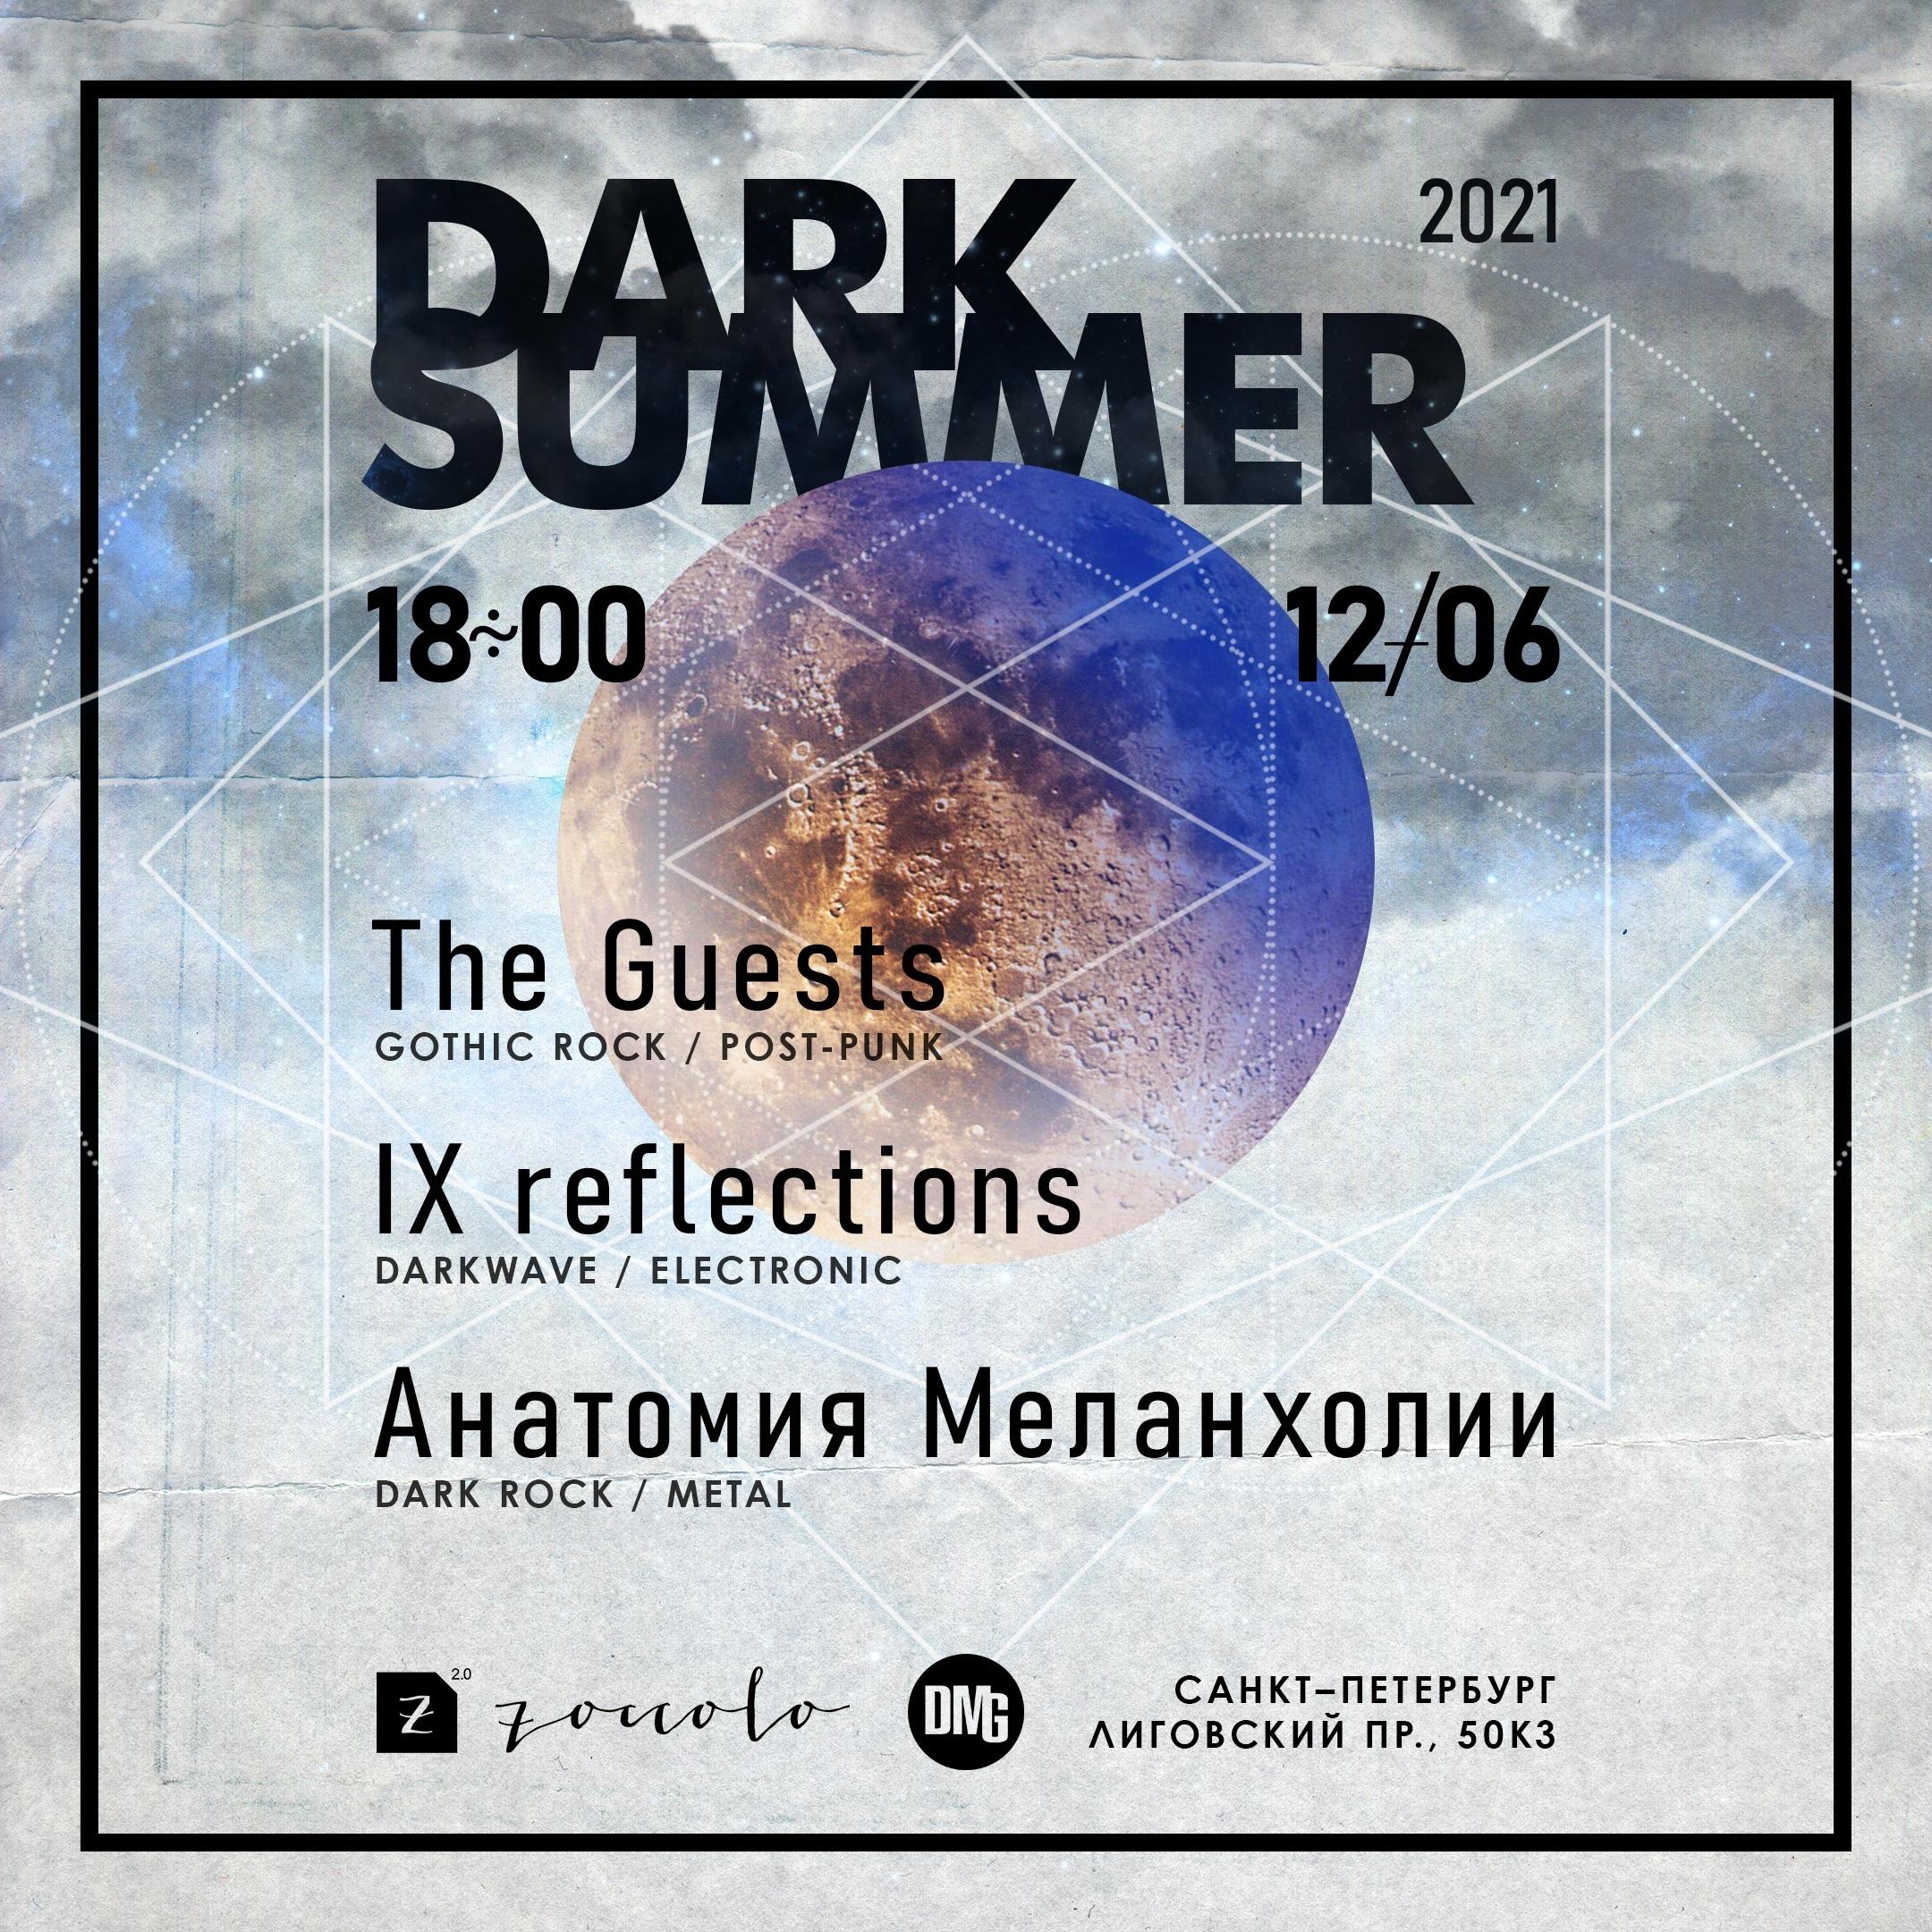 Dark Summer 2021 в Санкт-Петербурге 12.06